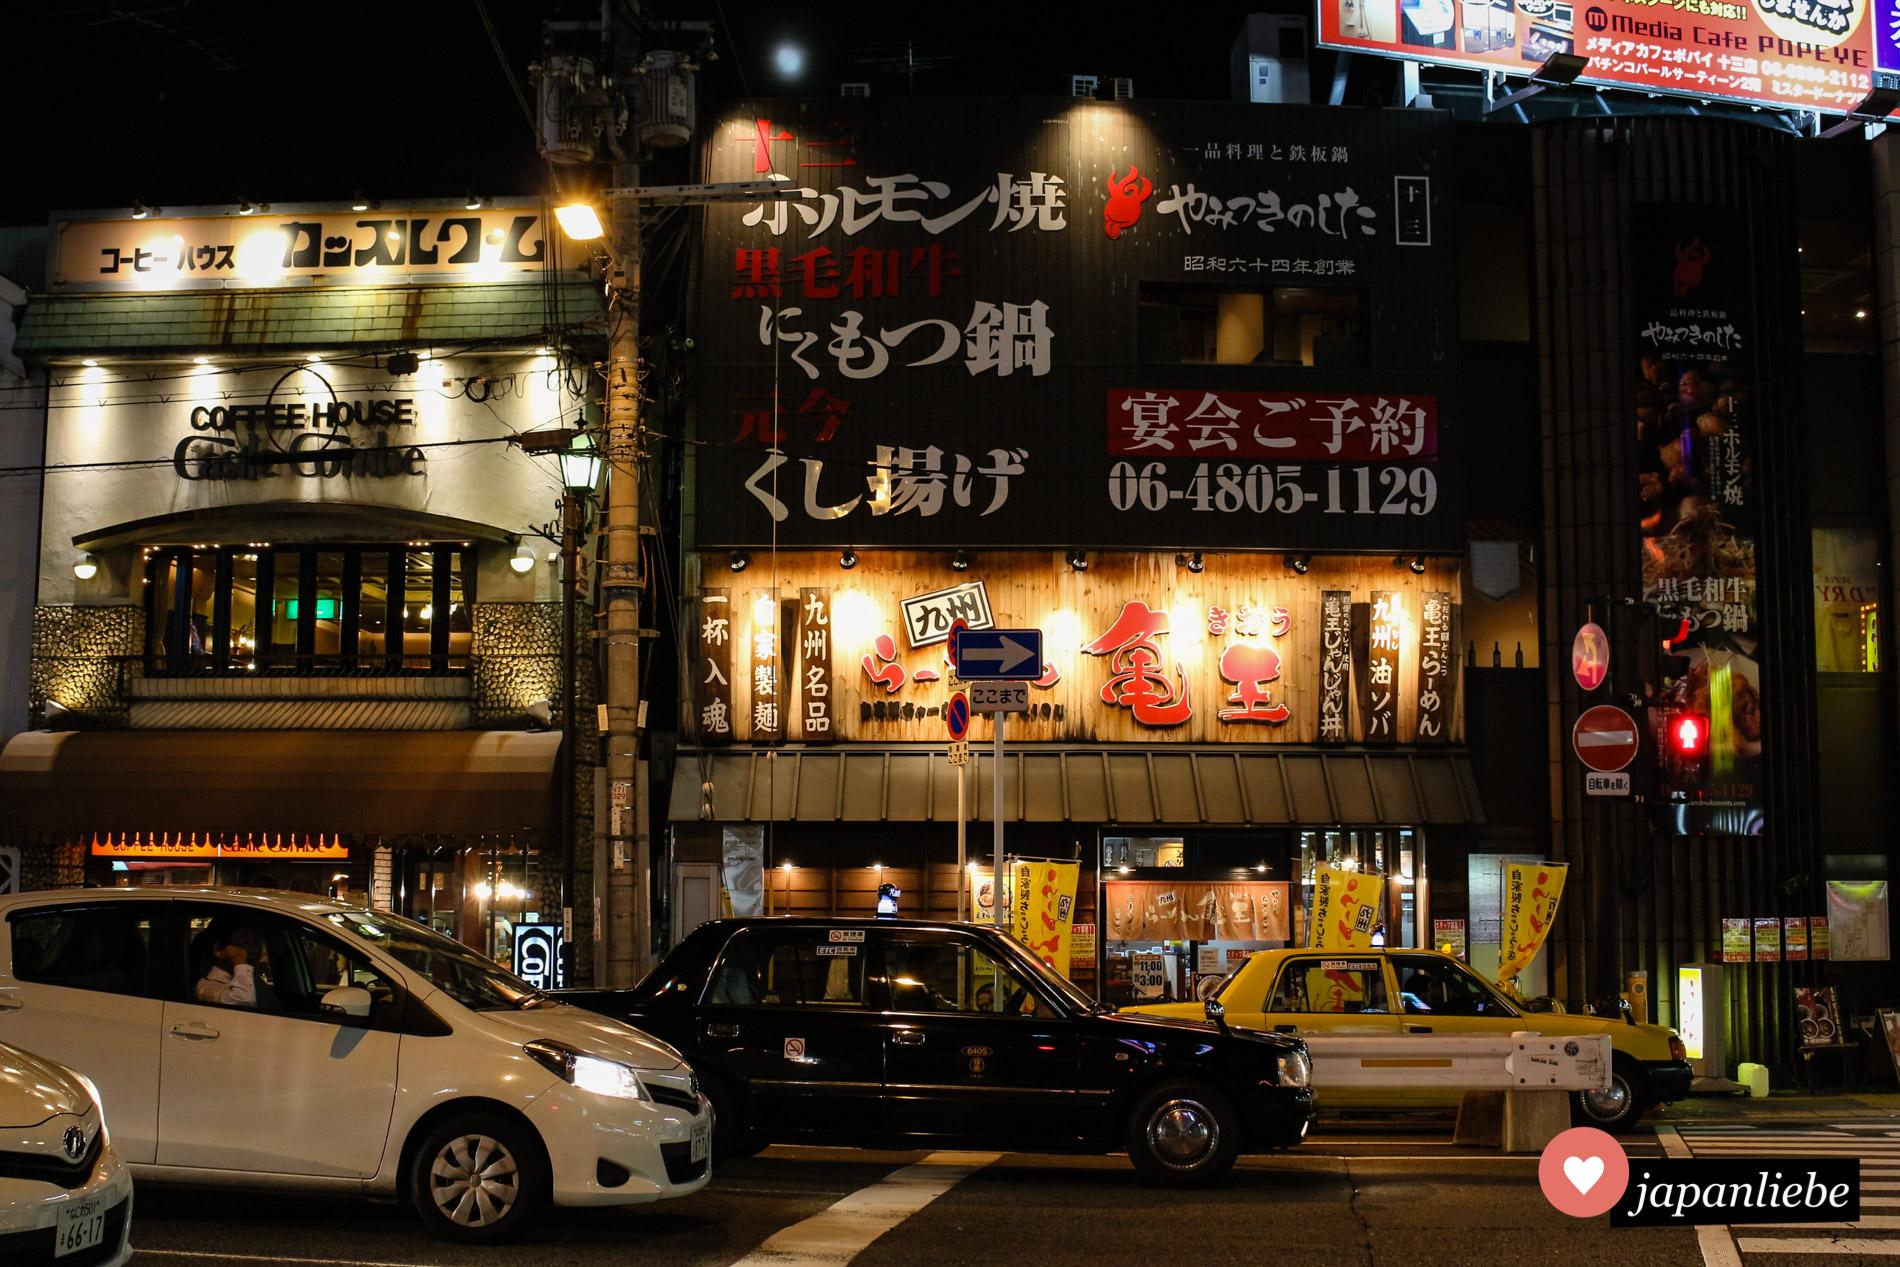 Ein Ramenrestaurant in Ōsakas Stadtteil Jūsō.